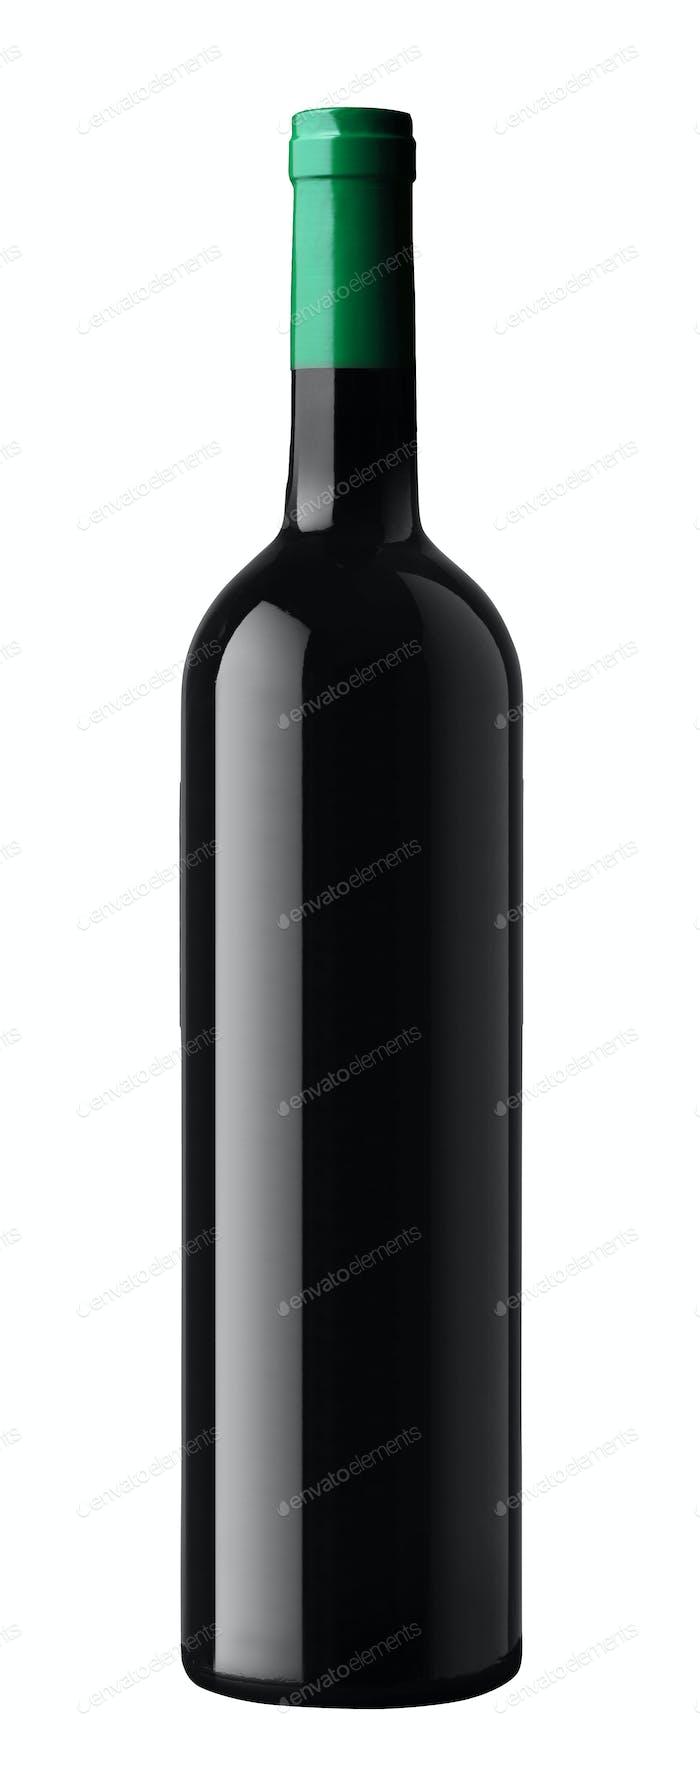 wine bottle isolated on whit?